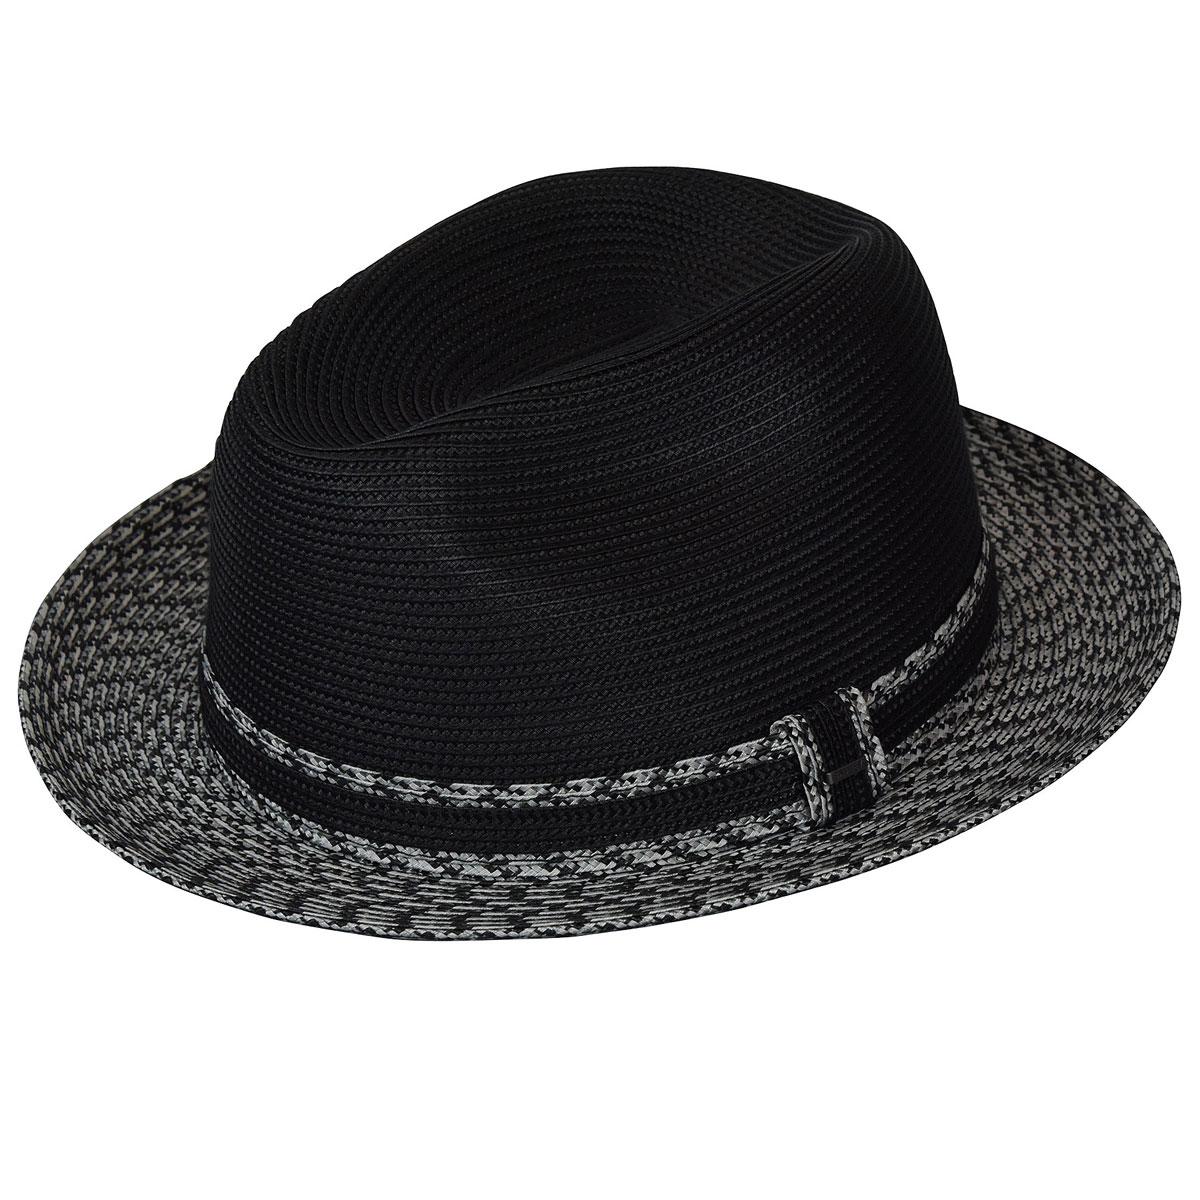 Bailey of Hollywood Mannesroe Braided Fedora in Black,Charcoal Multi